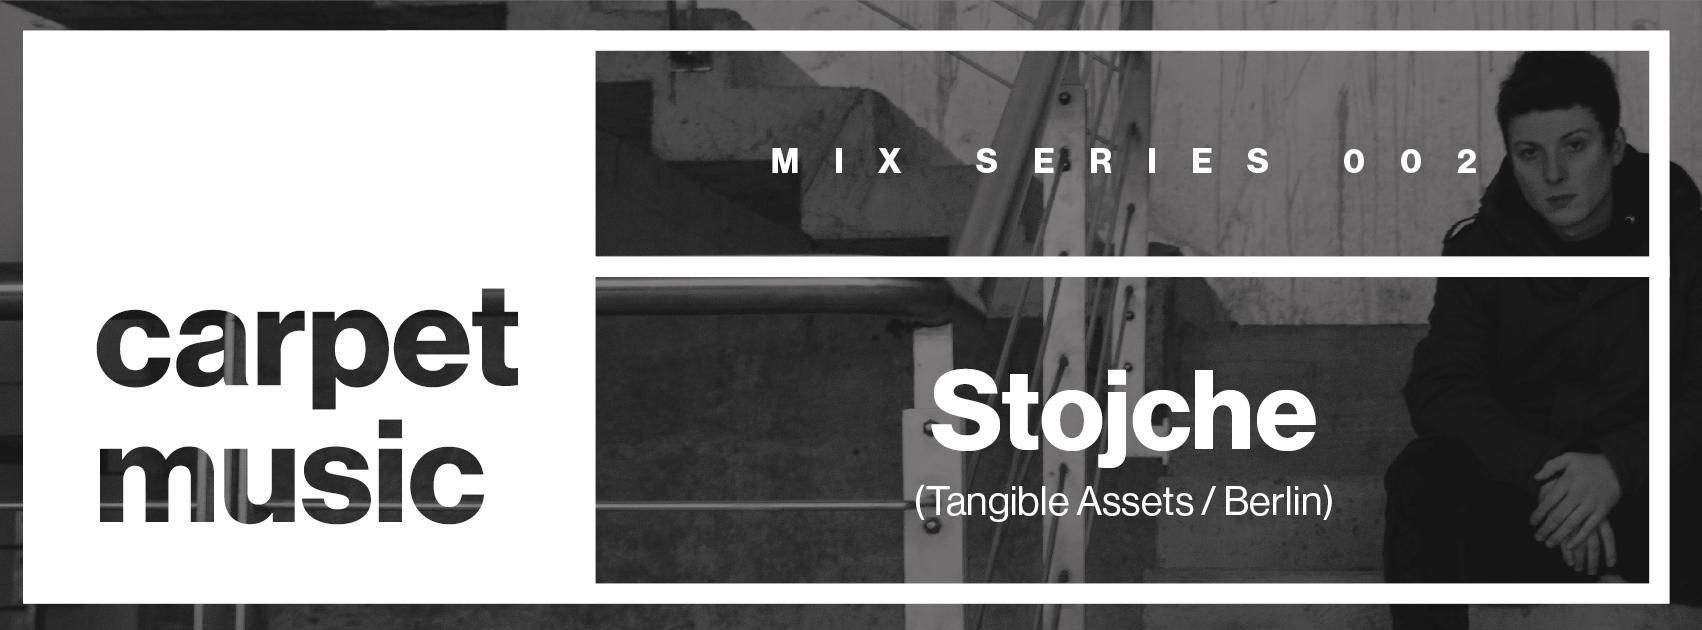 Carpet Music Mix Series 002 w_ Stojche (banner)